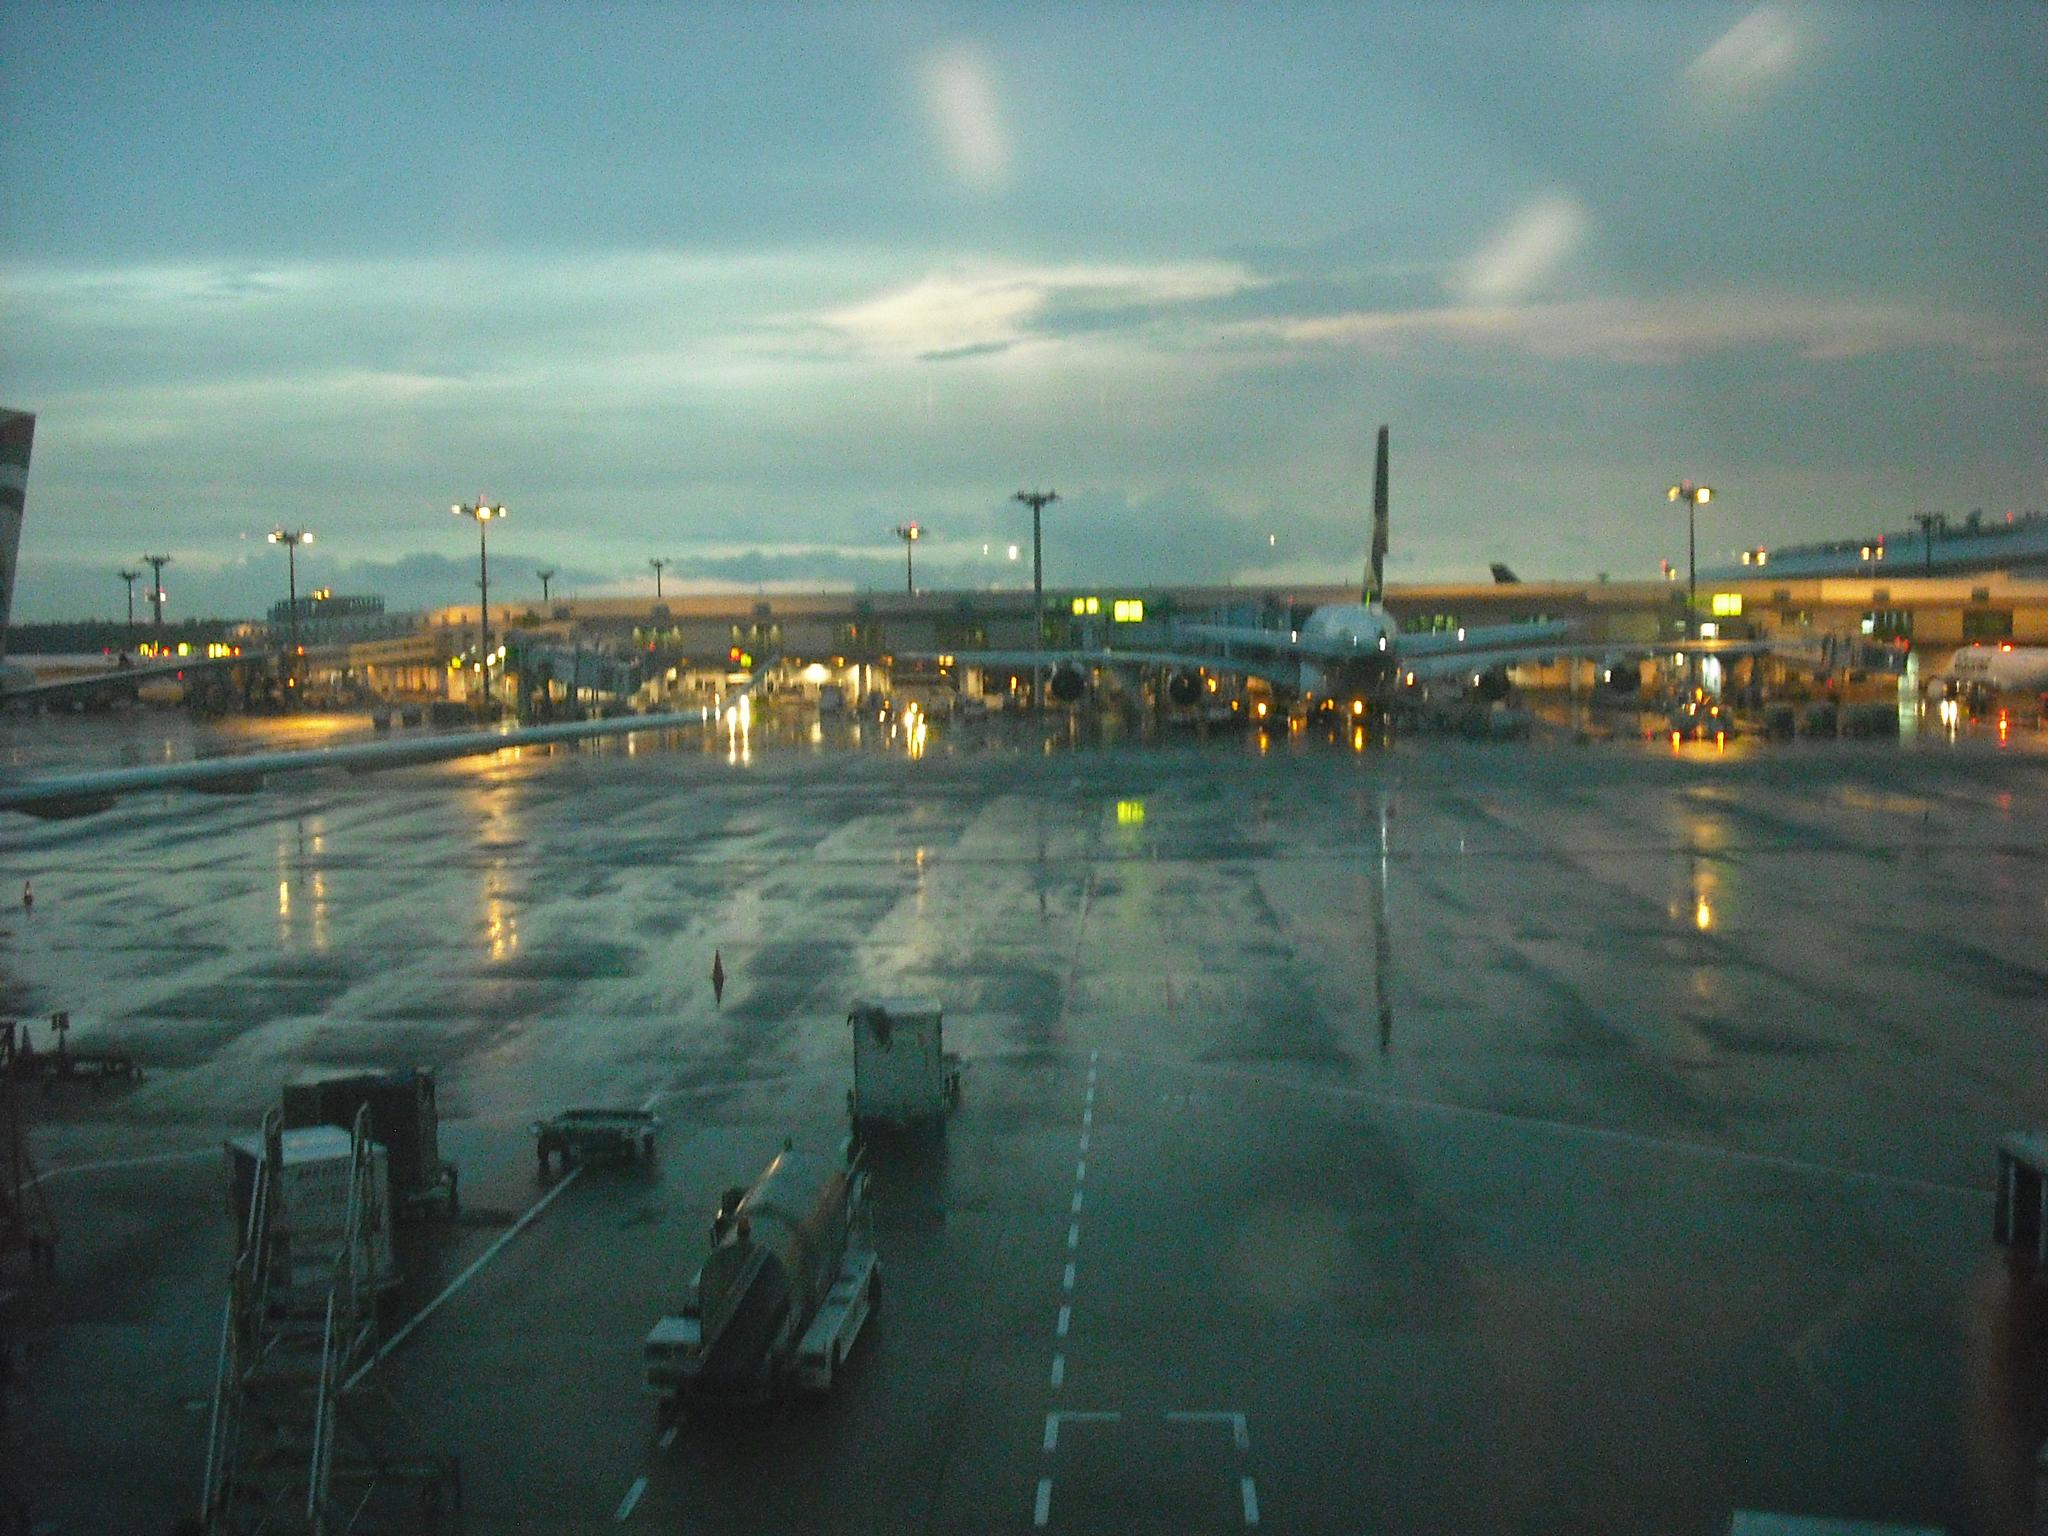 Changi airport by Brian Johnson